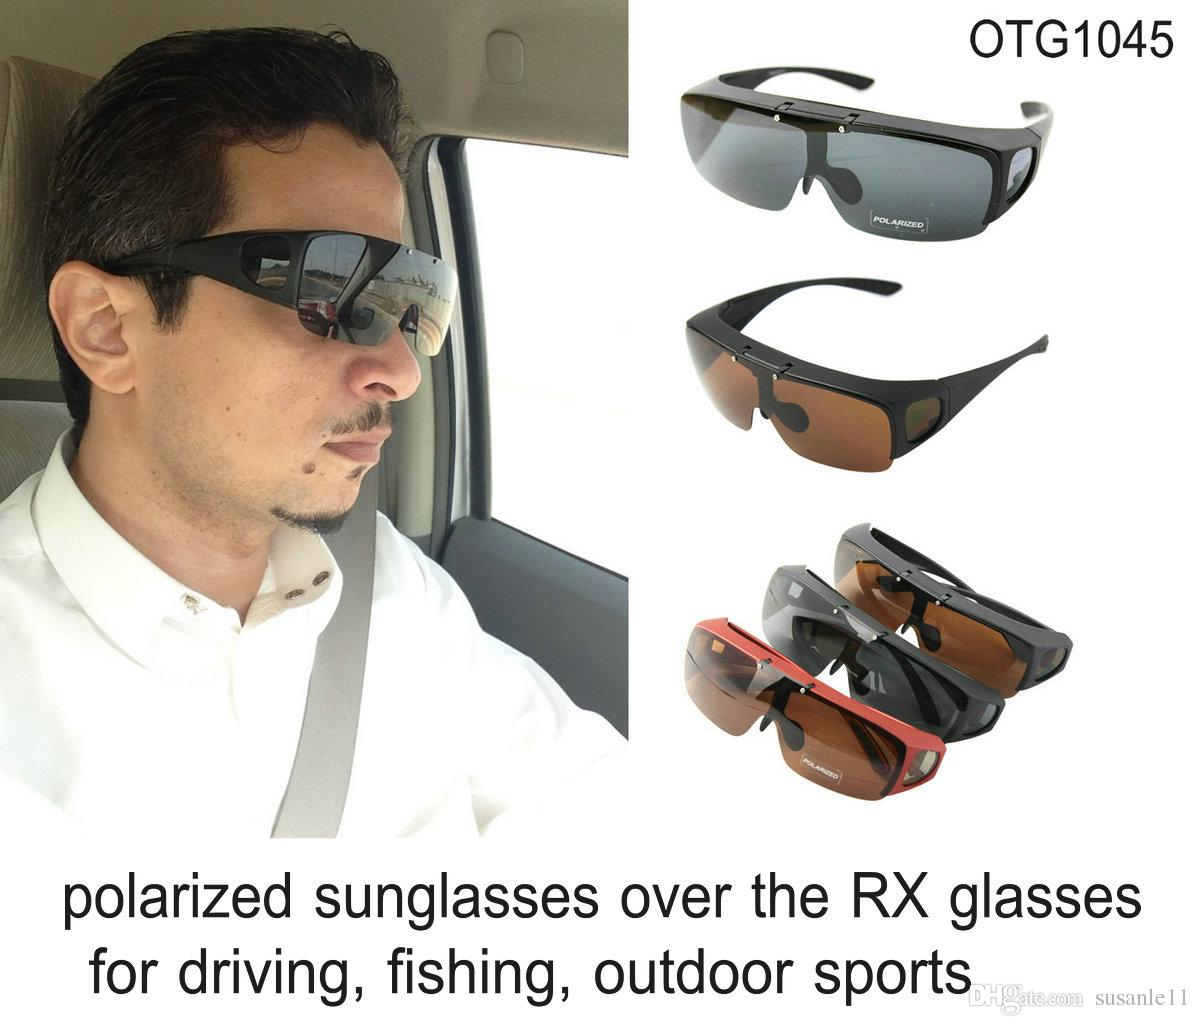 best polarized sunglasses for driving  New Flip Up Polarized Sunglasses That Fit Over Optical Eyeglasses ...